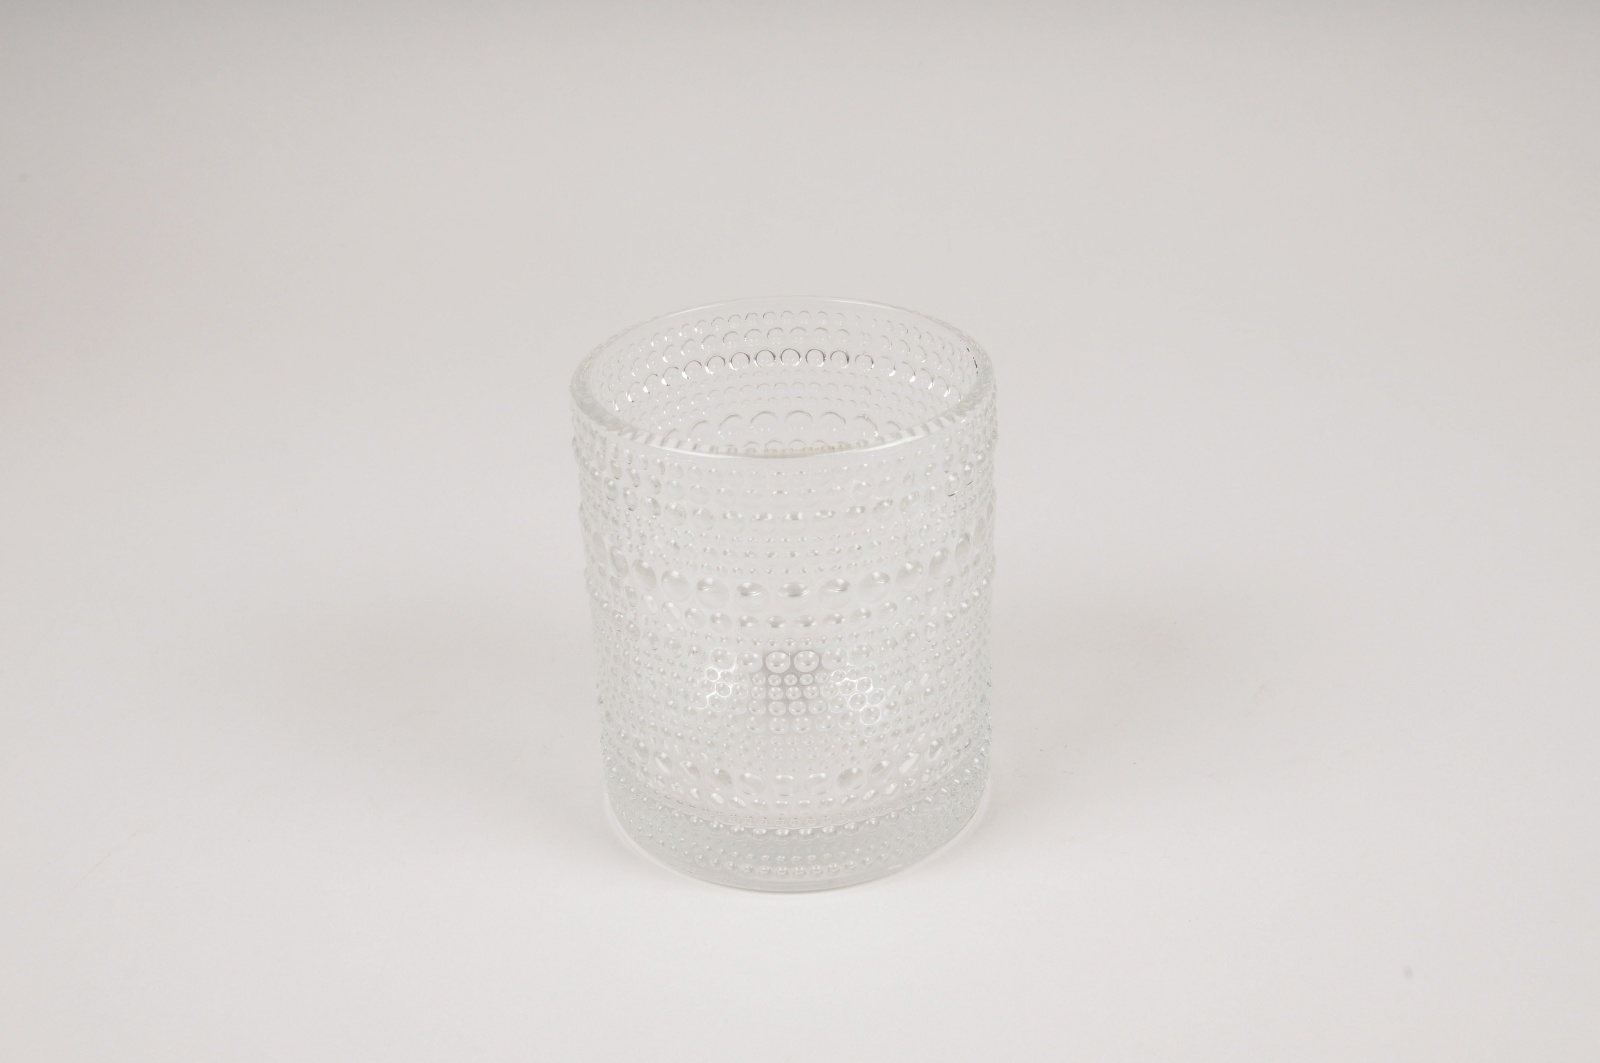 B038IH Vase en verre transparent D9cm H10cm